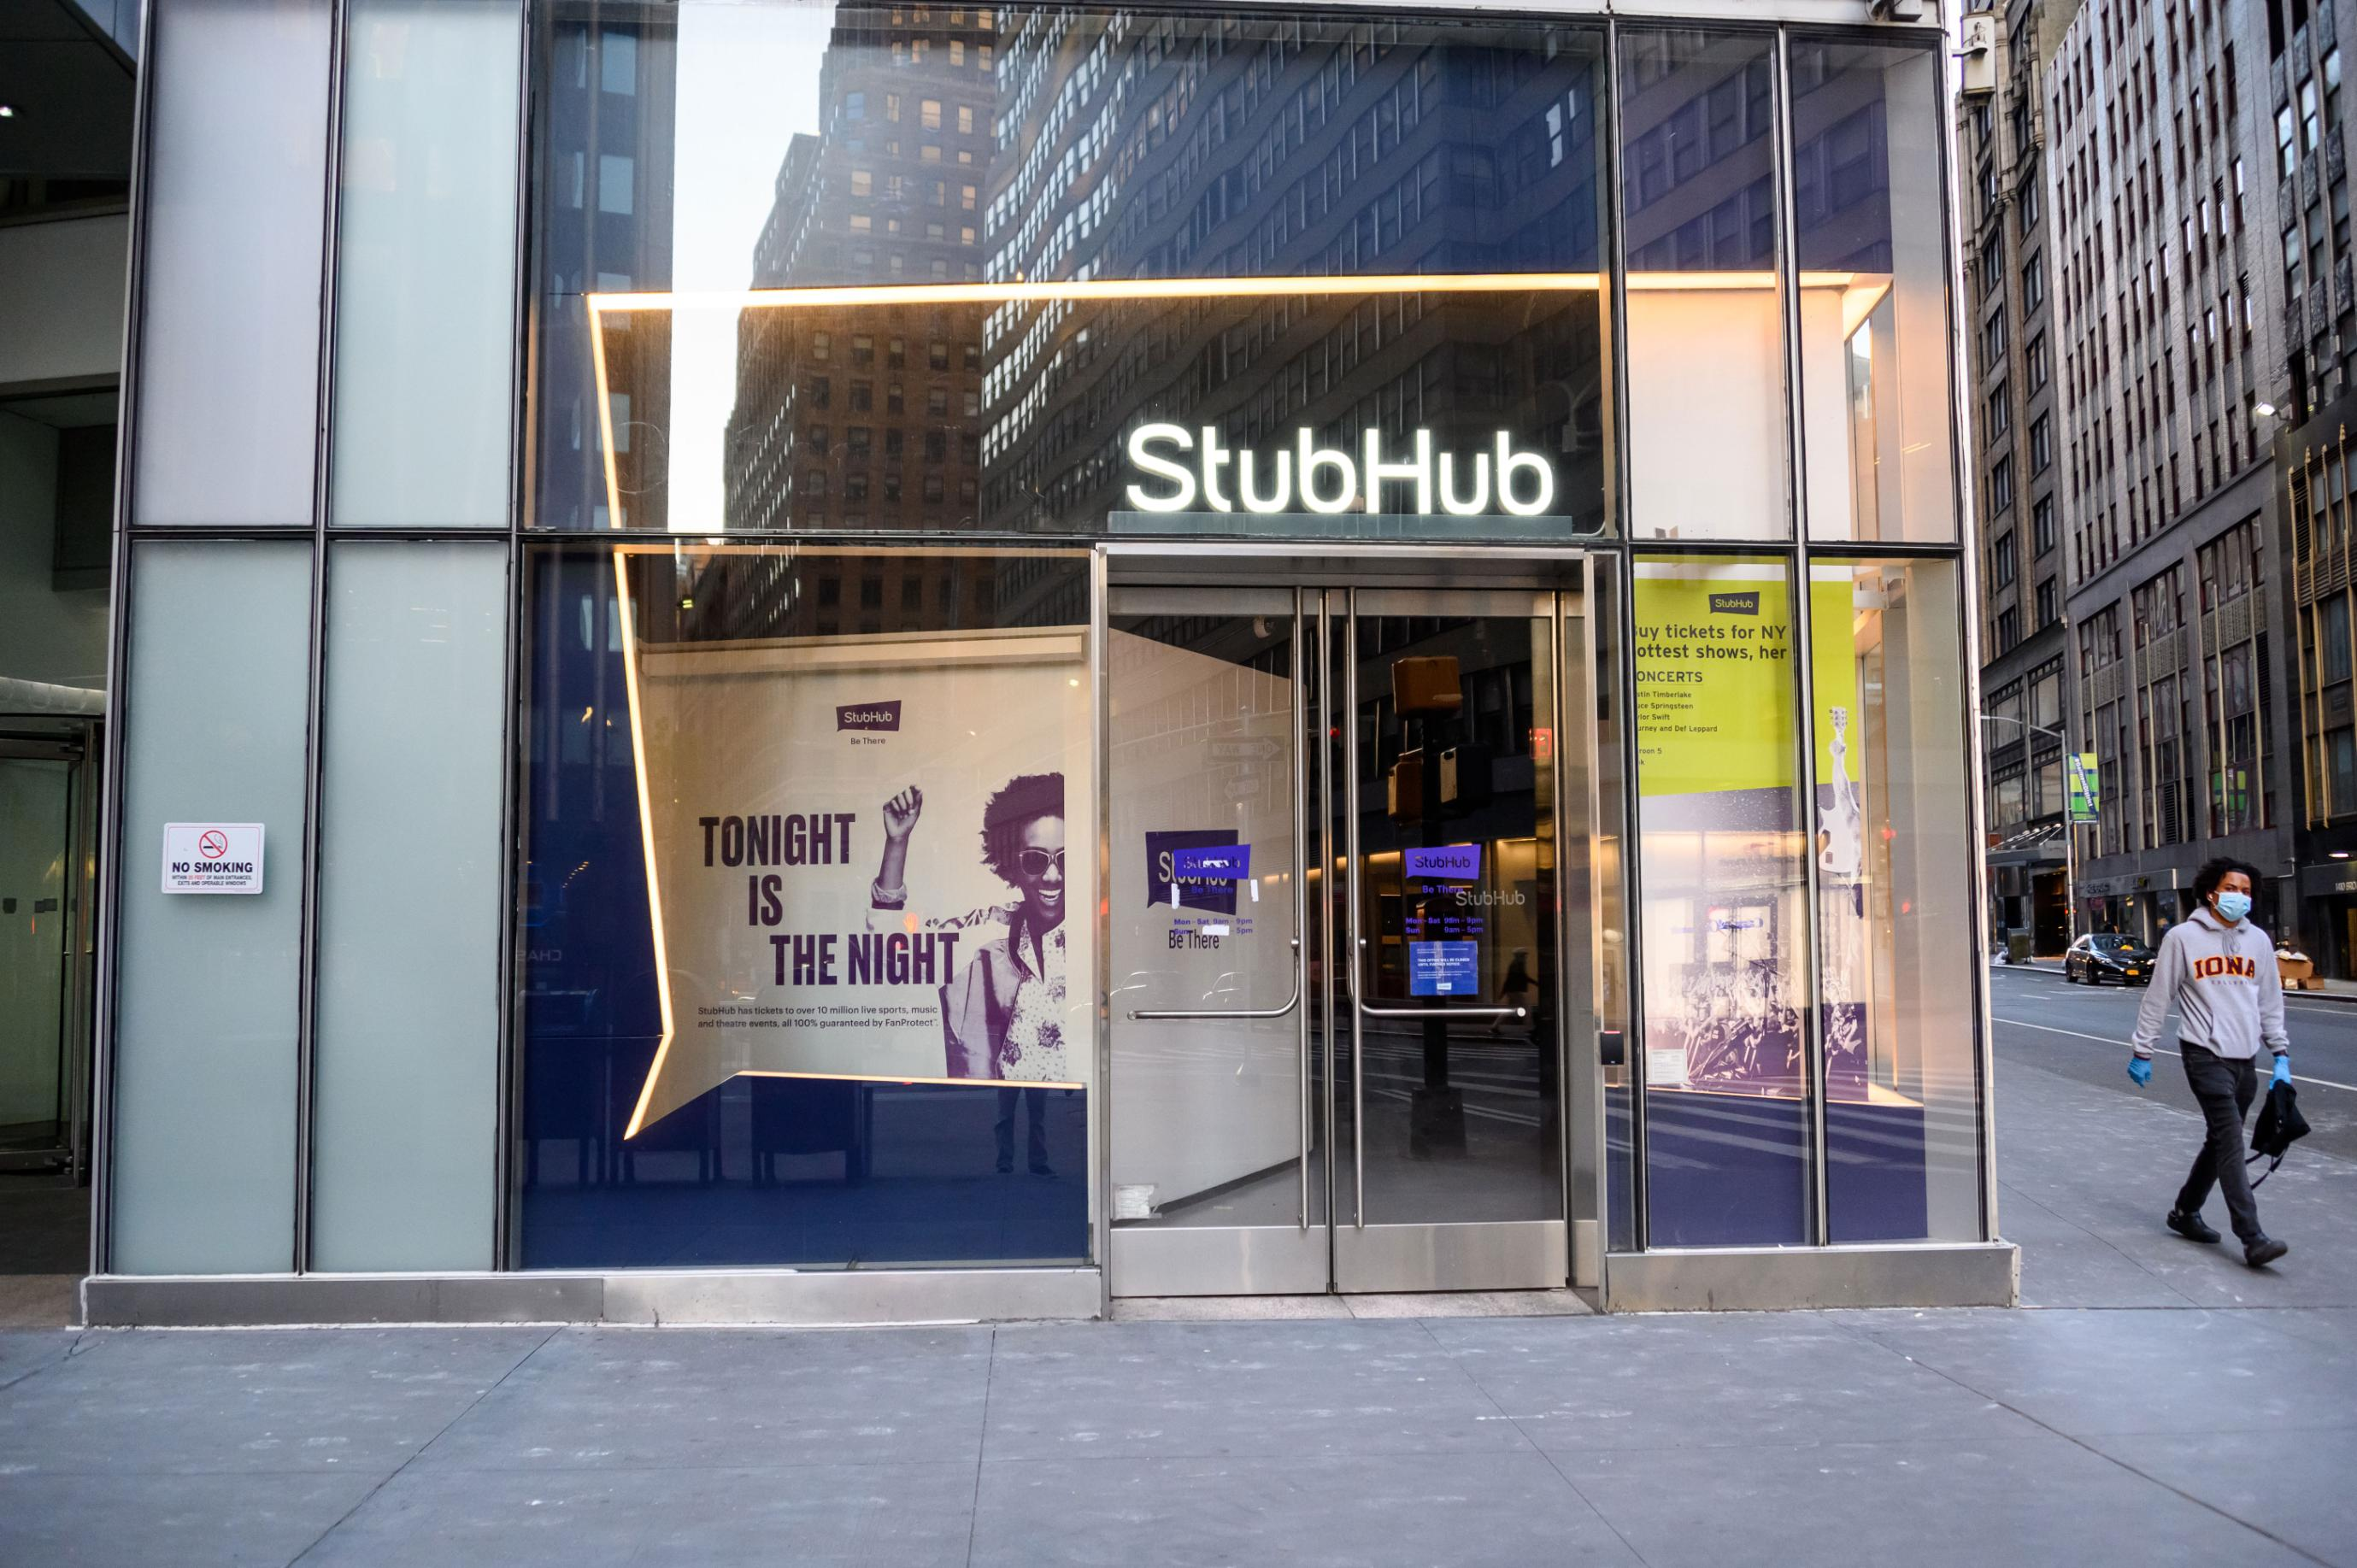 Viagogo's $4 billion purchase of Stubhub is in trouble